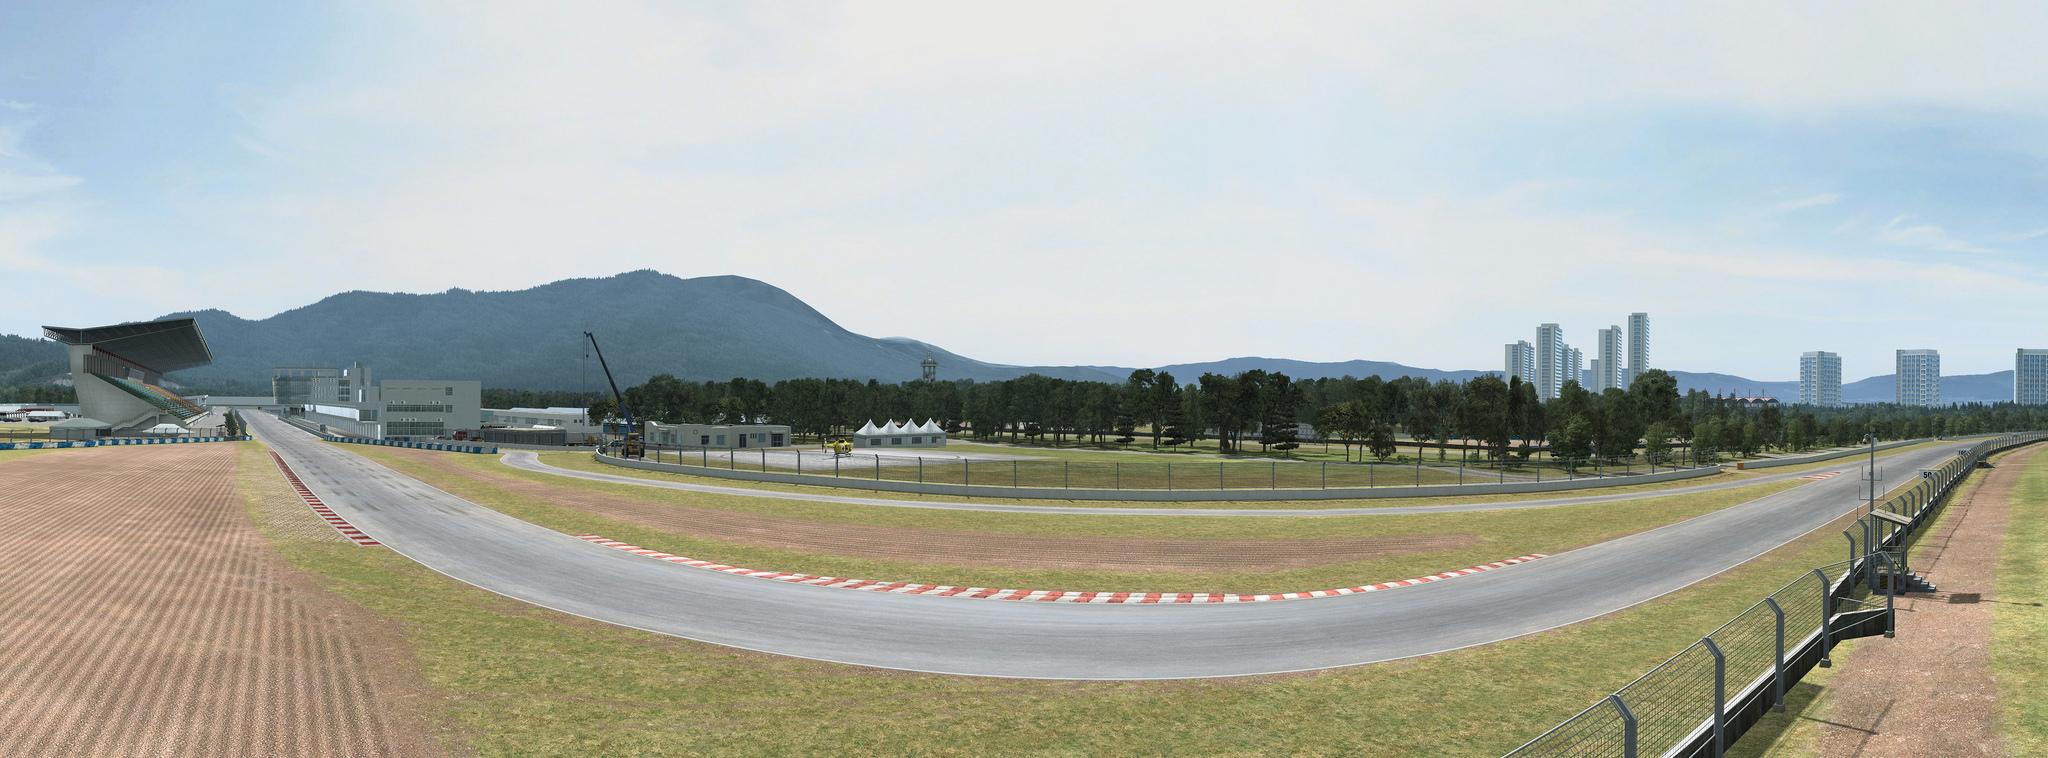 RaceRoom Zhuhai International Circuit 1.jpg